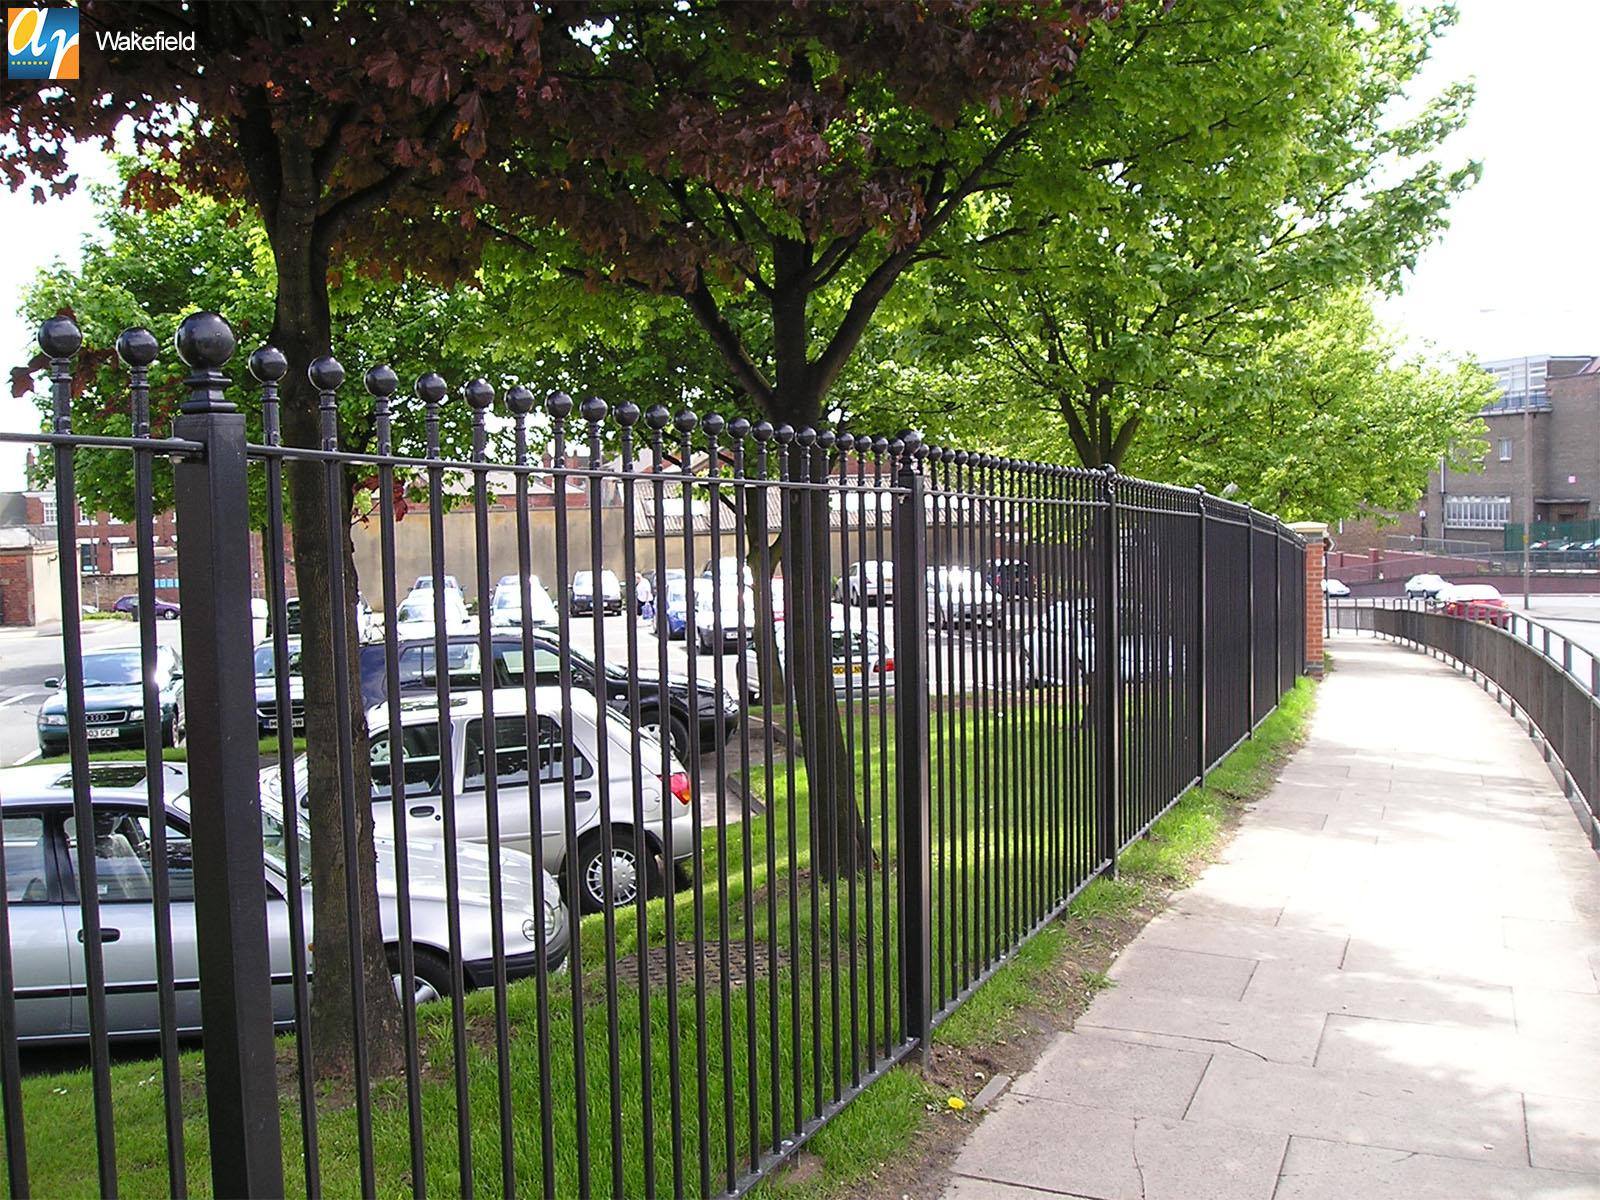 Wakefield Car Park